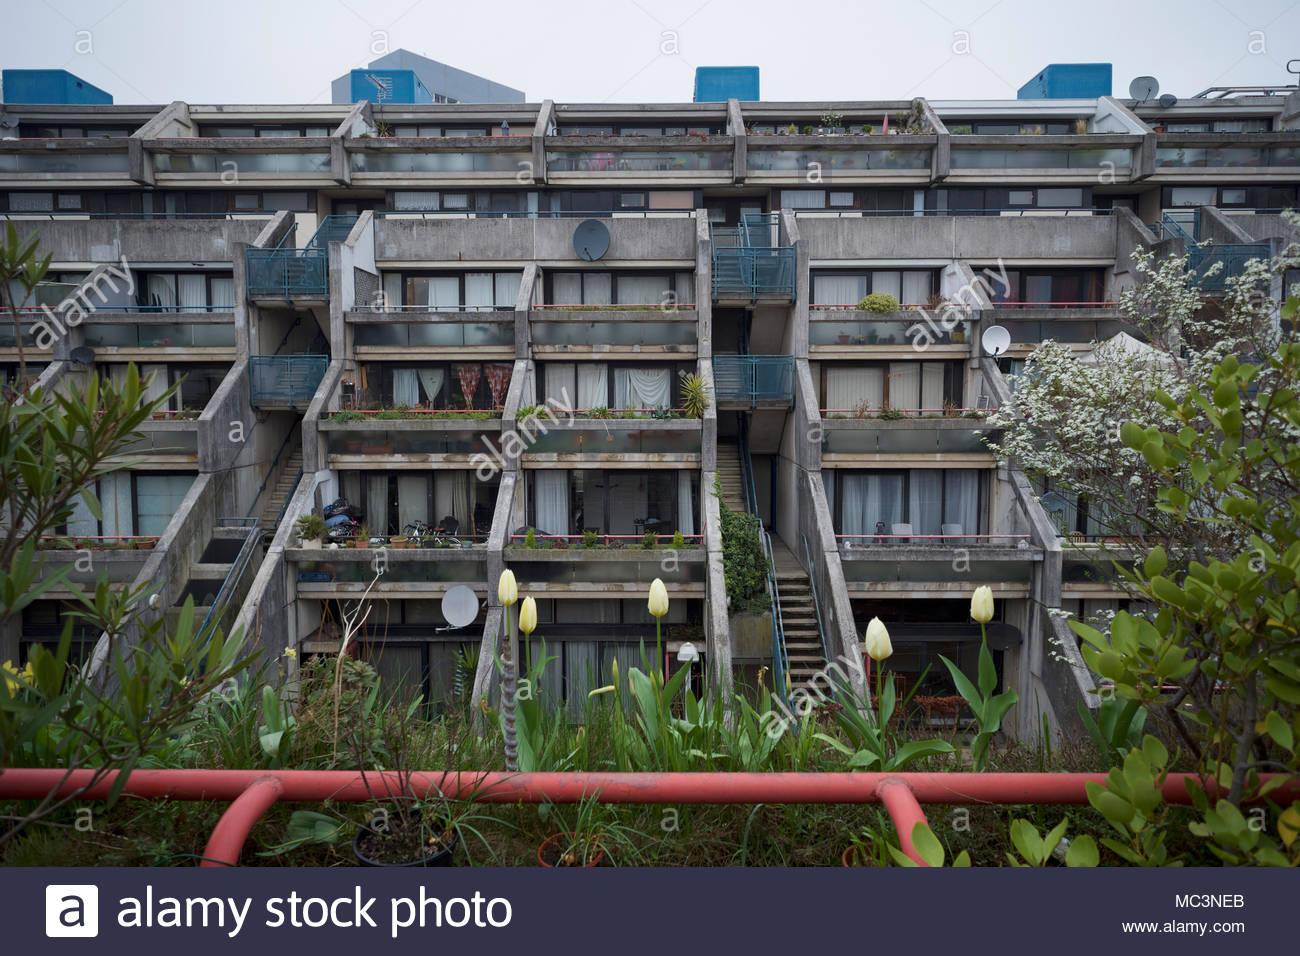 Alexandra Road housing estate in Camden: London. Stock Photo